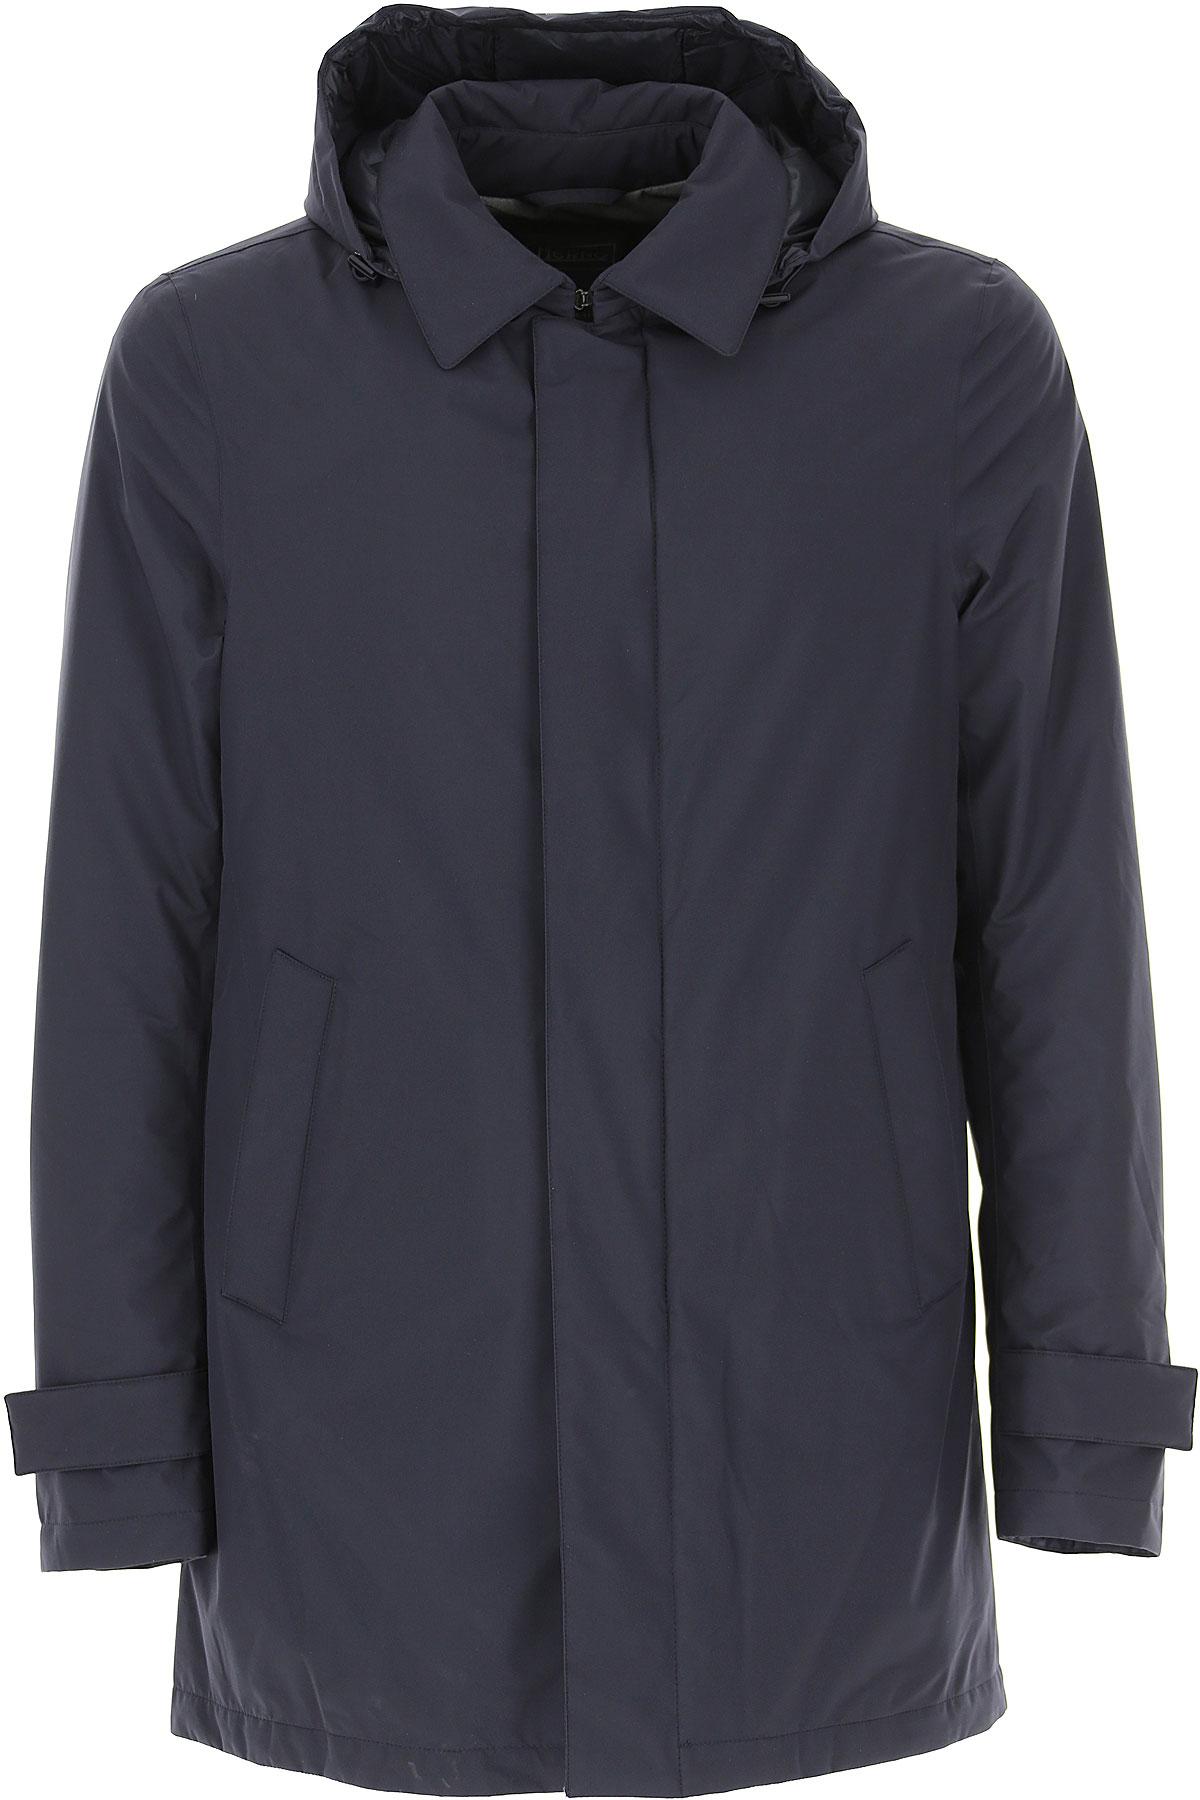 Herno Down Jacket for Men, Puffer Ski Jacket On Sale, Blue Ink, polyester, 2019, L M S XXL XXXL